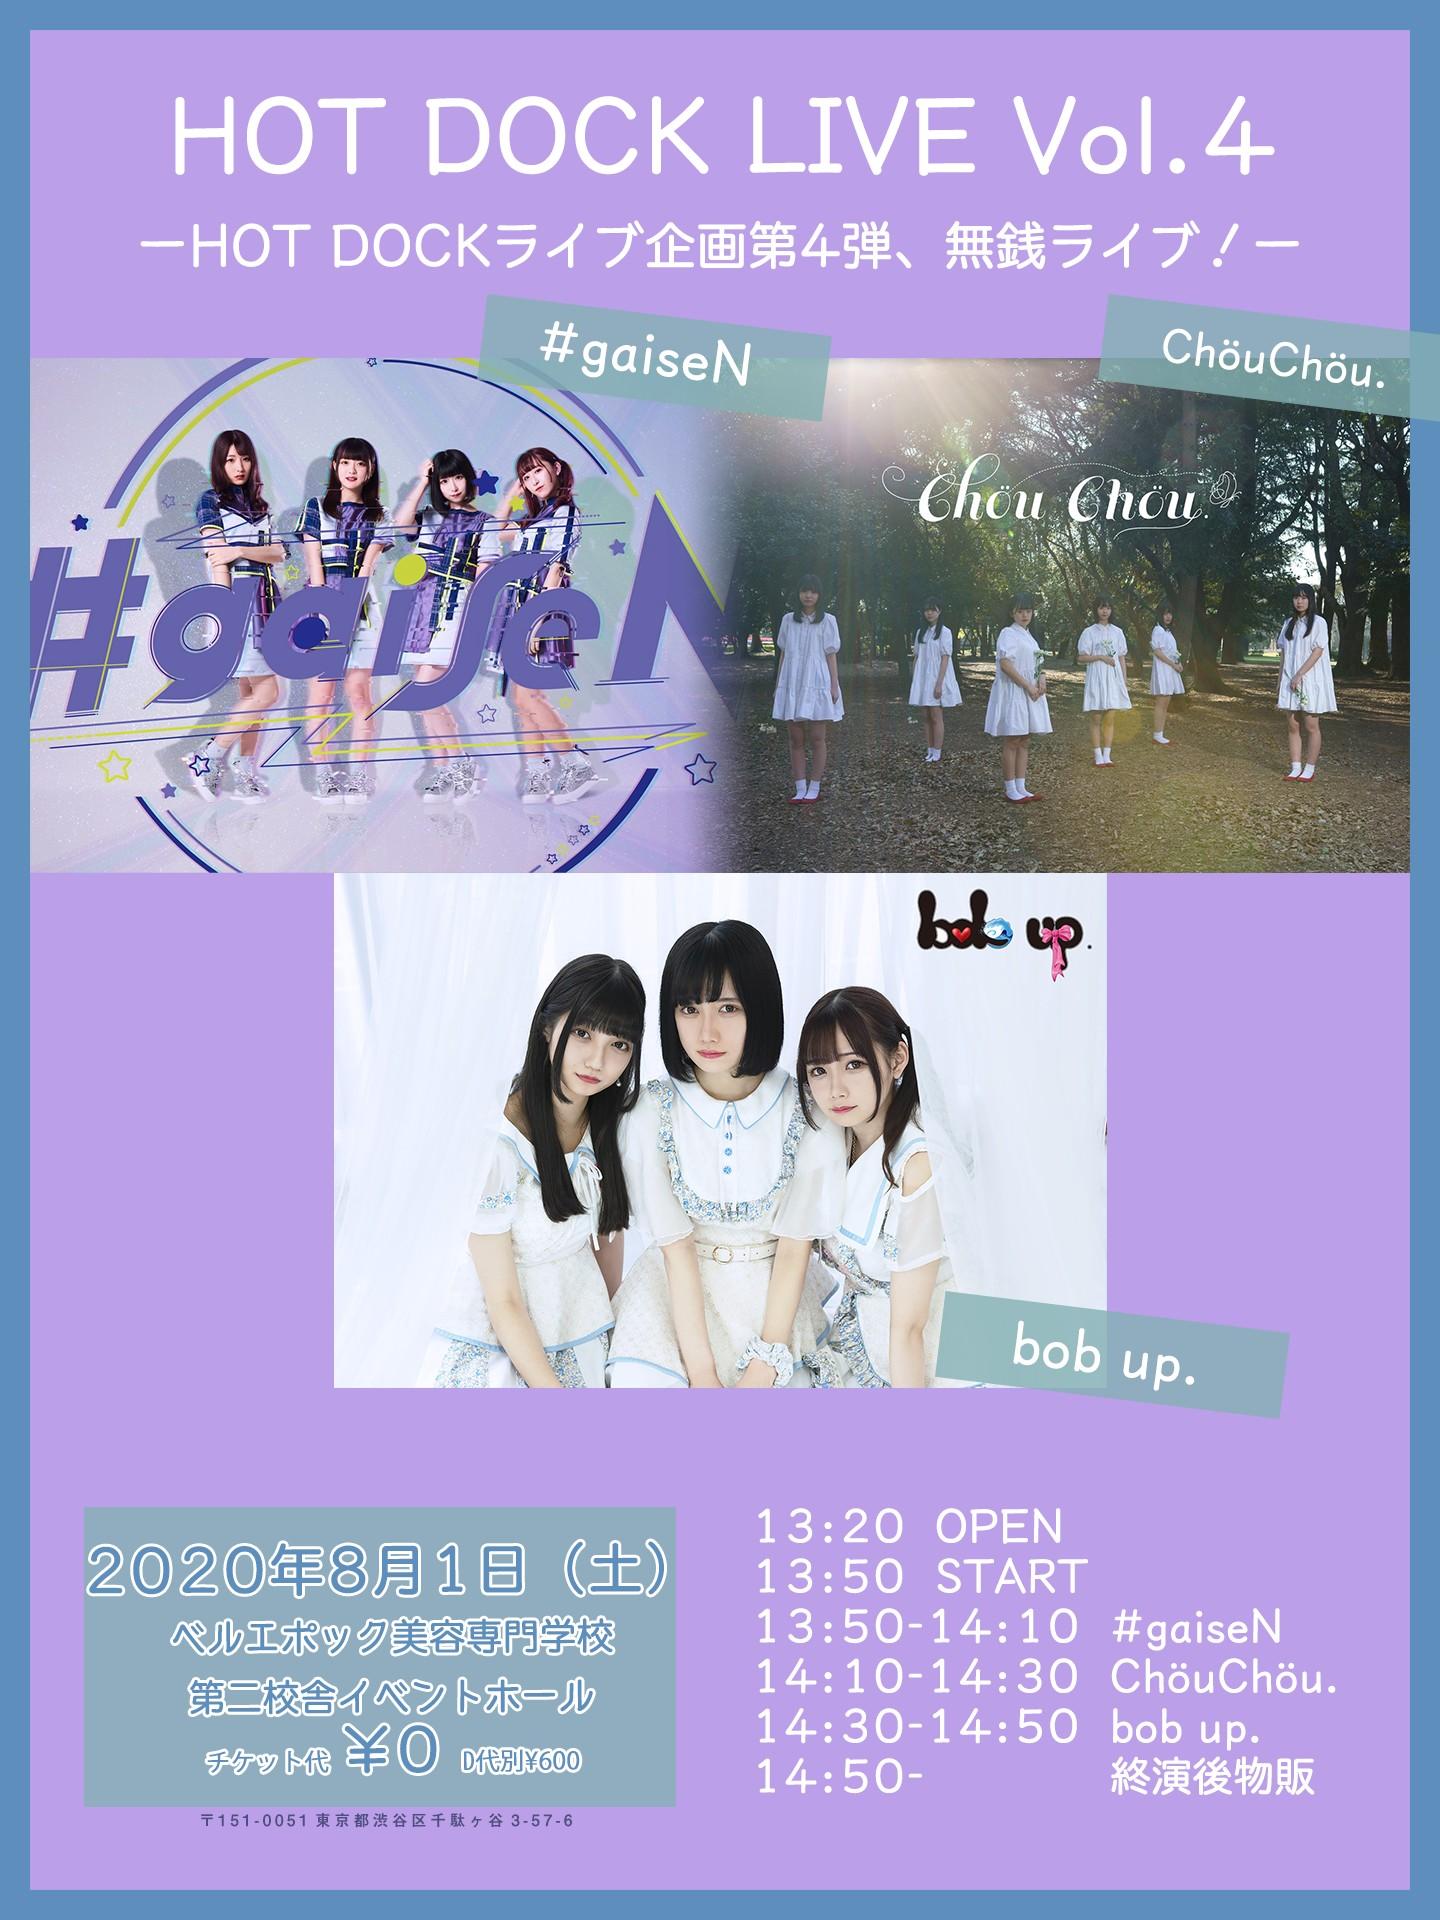 HOT DOCK LIVE Vol.4 無銭ライブ